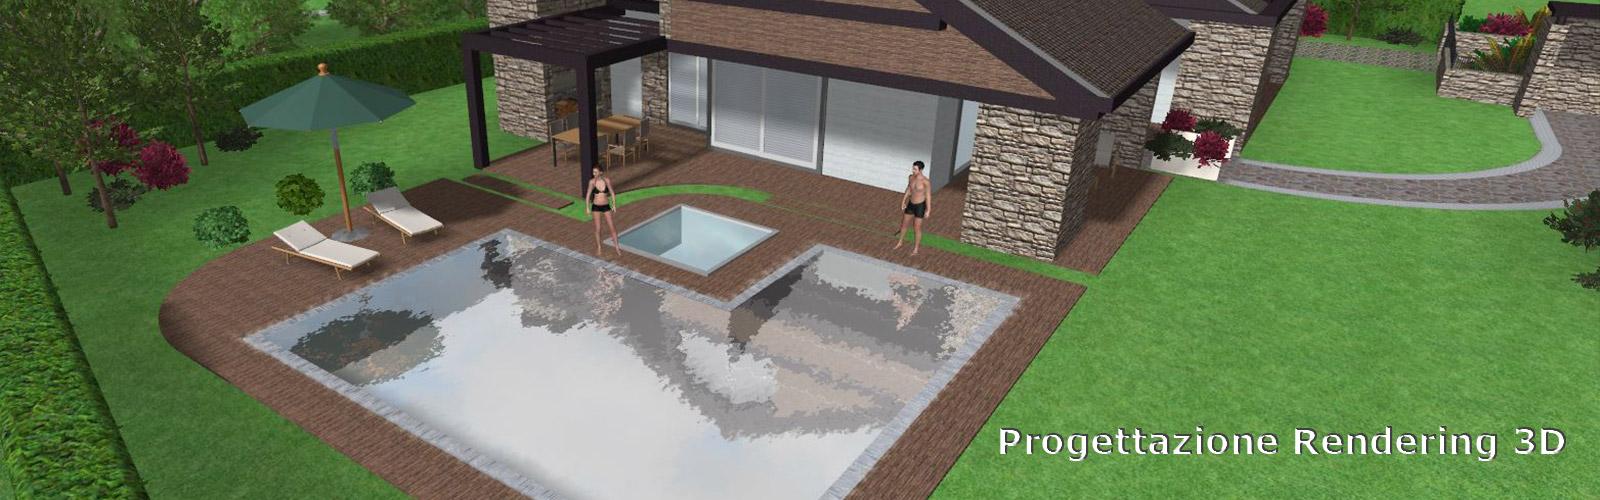 Ndertim pishinash Queens Piscine  Costruttori di piscine